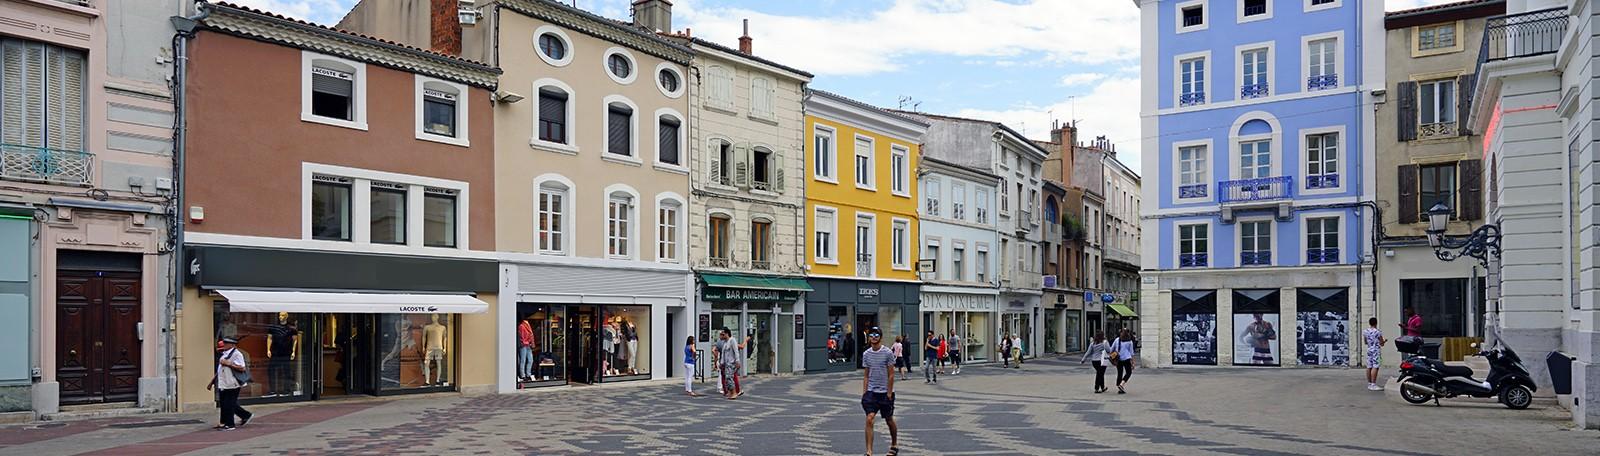 Parking Chareton Ouest - 1 Cours Chareton 26000 Valence